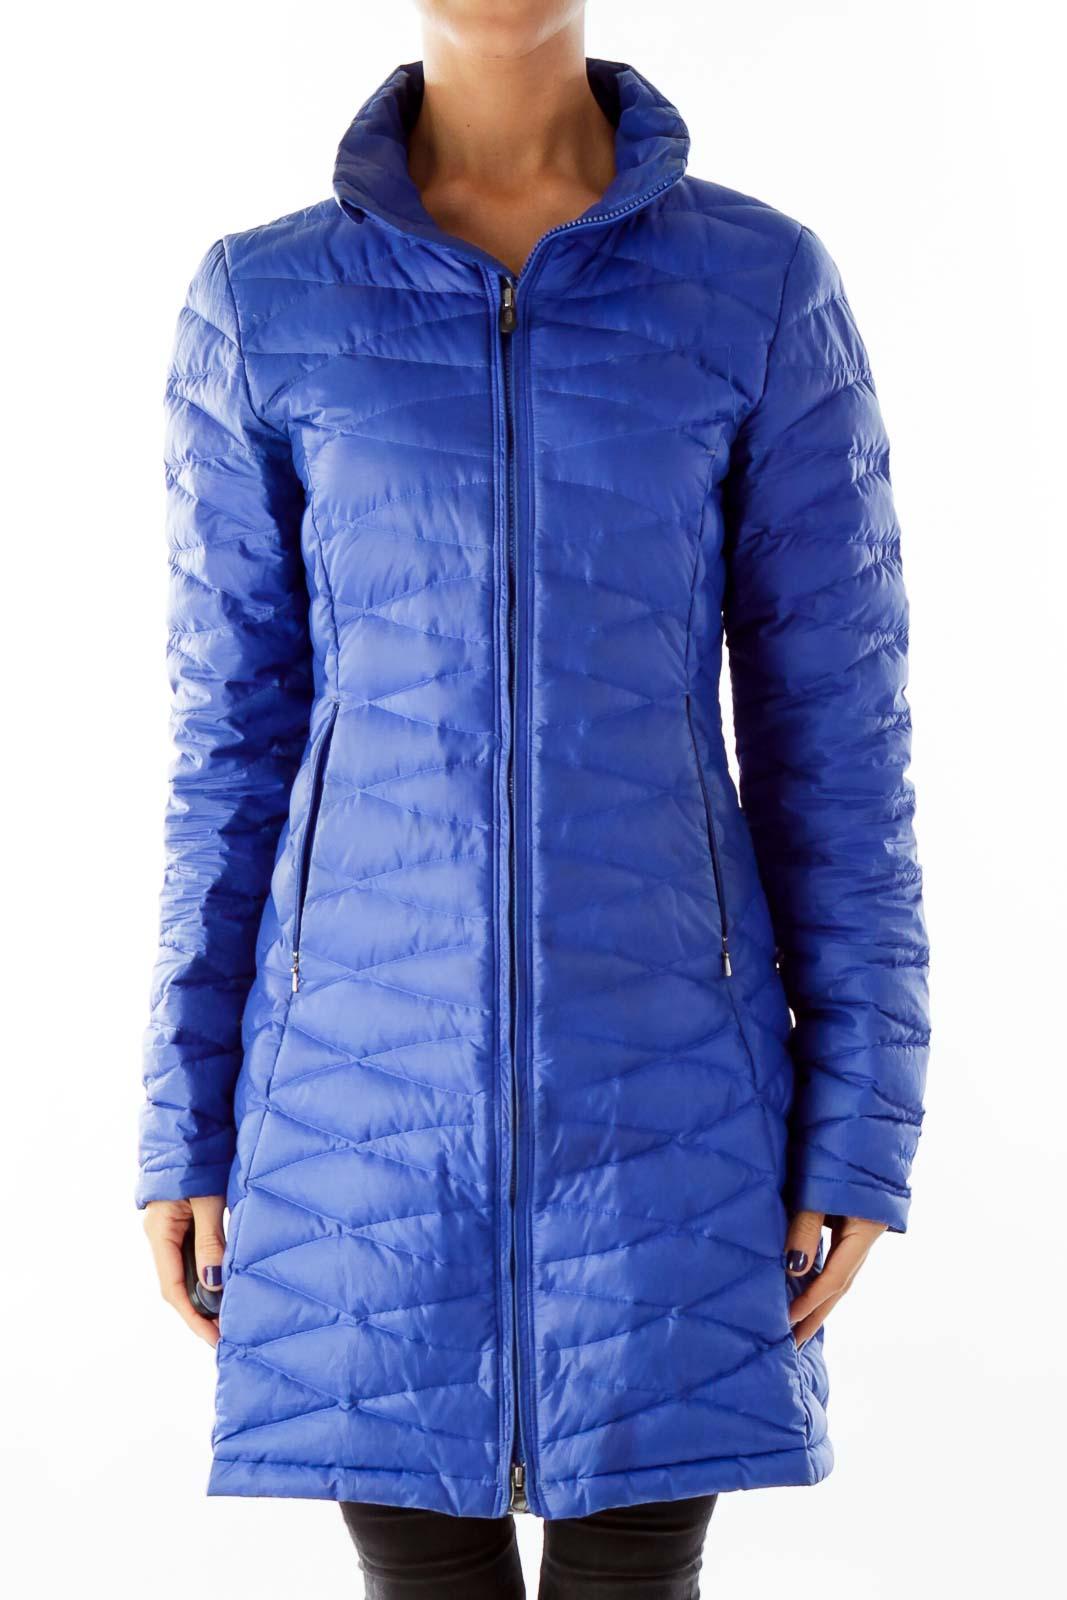 Blue Puffy Sport Jacket